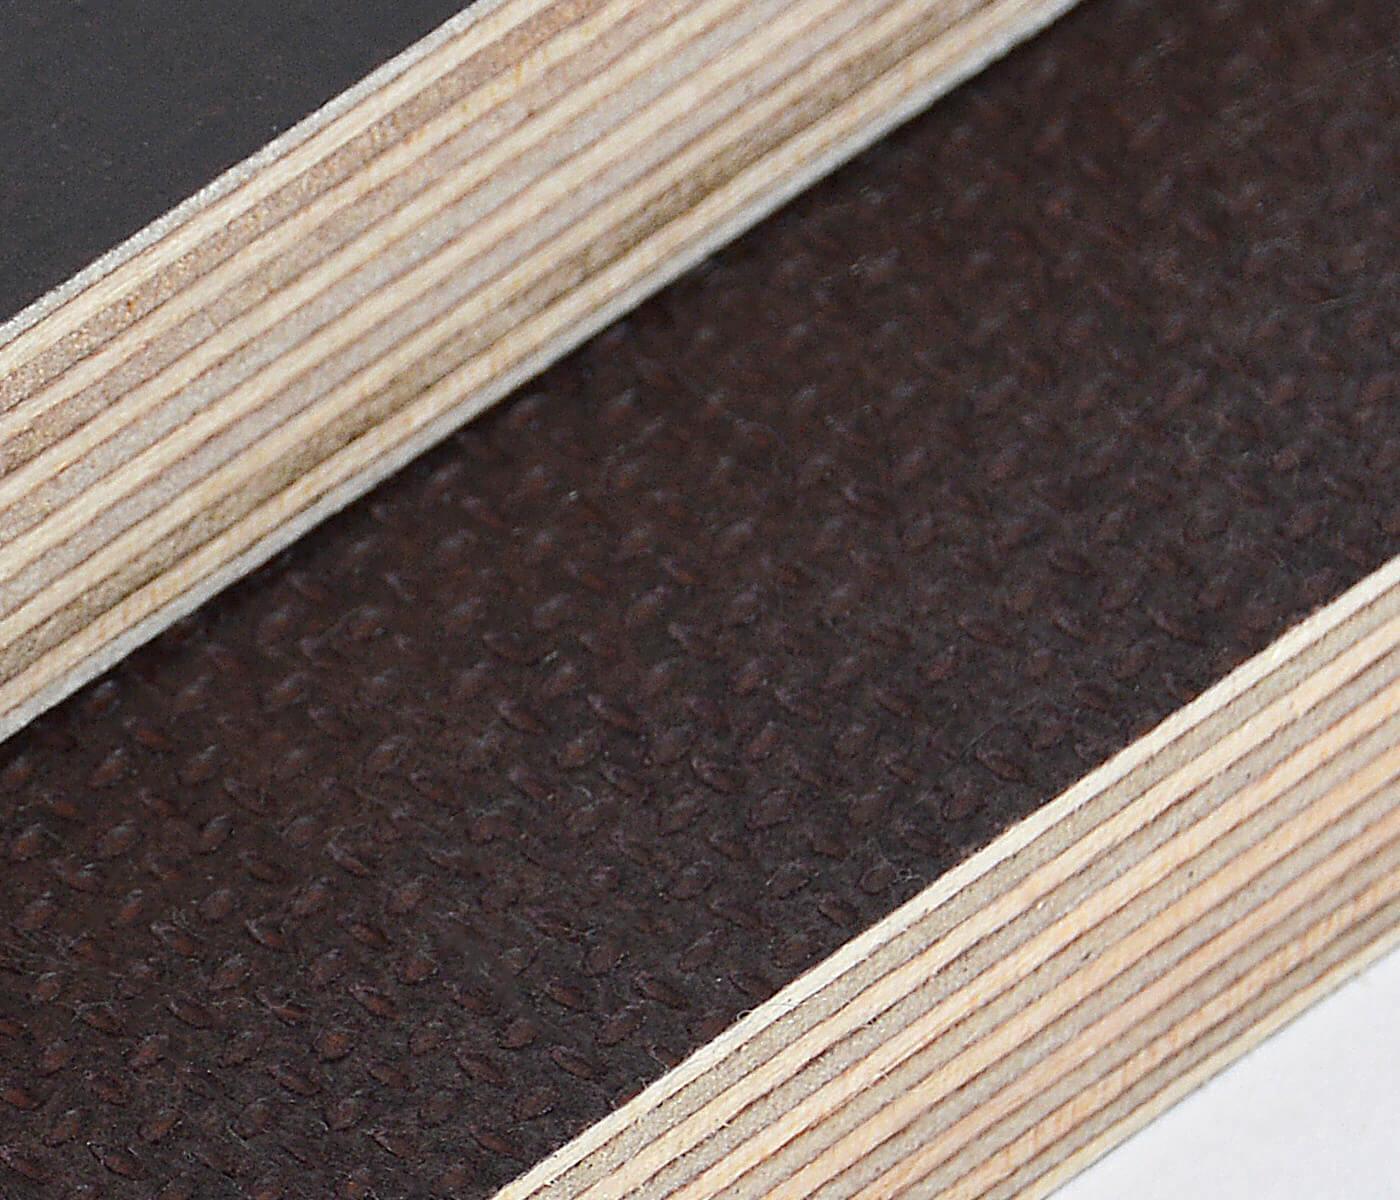 30x80 cm 9mm Multiplex Zuschnitt L/änge bis 200cm Multiplexplatten Zuschnitte Auswahl